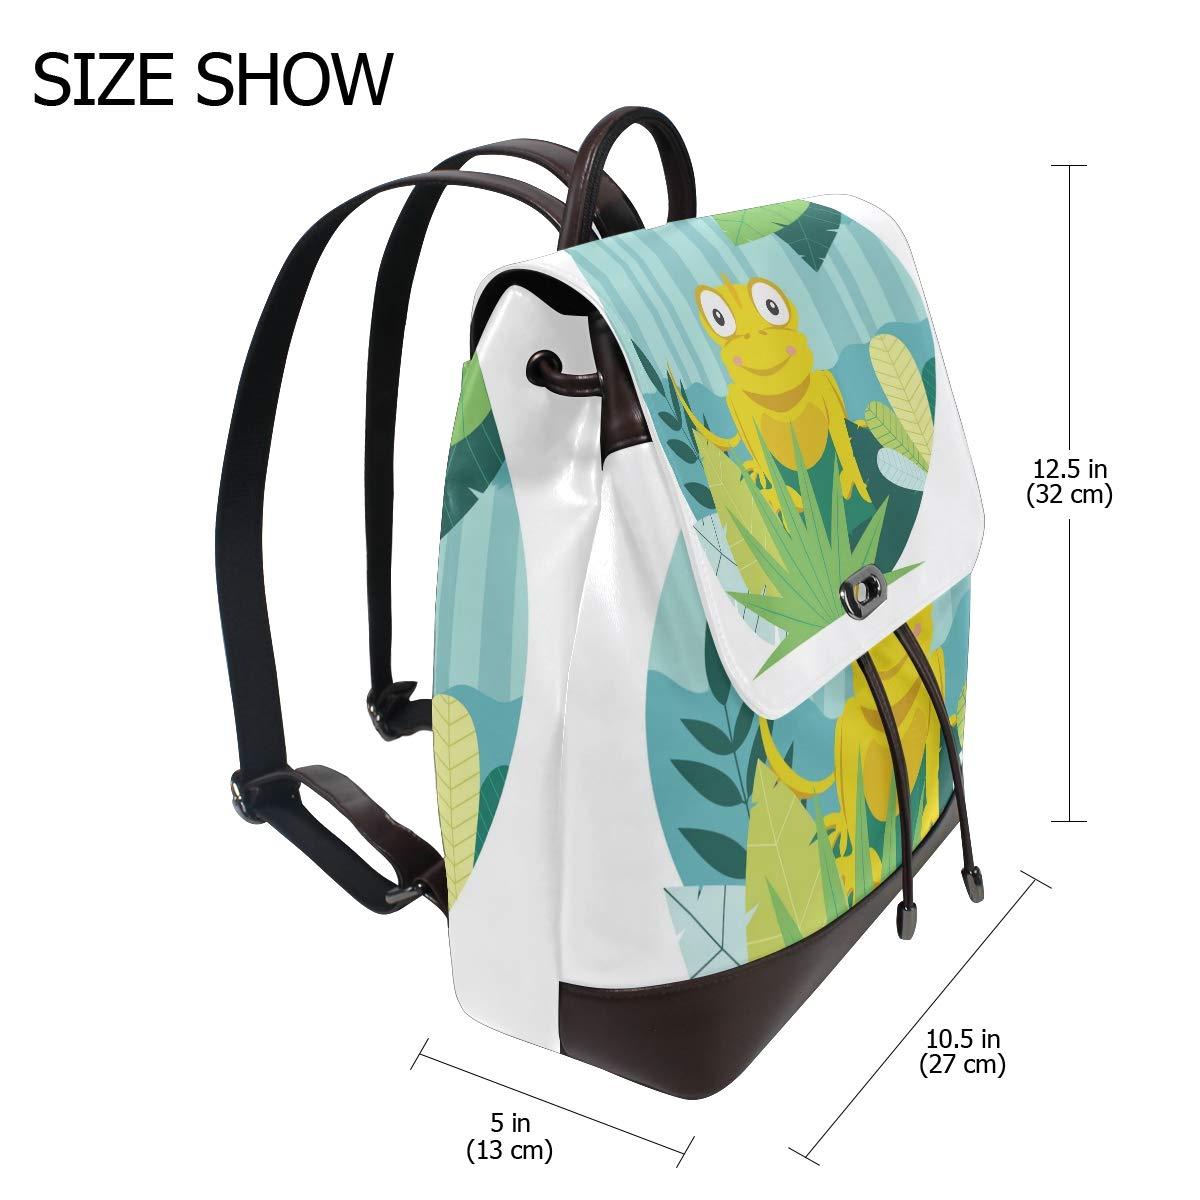 PU Leather Shoulder Bag,Cartoon Yellow Chameleon Backpack,Portable Travel School Rucksack,Satchel with Top Handle